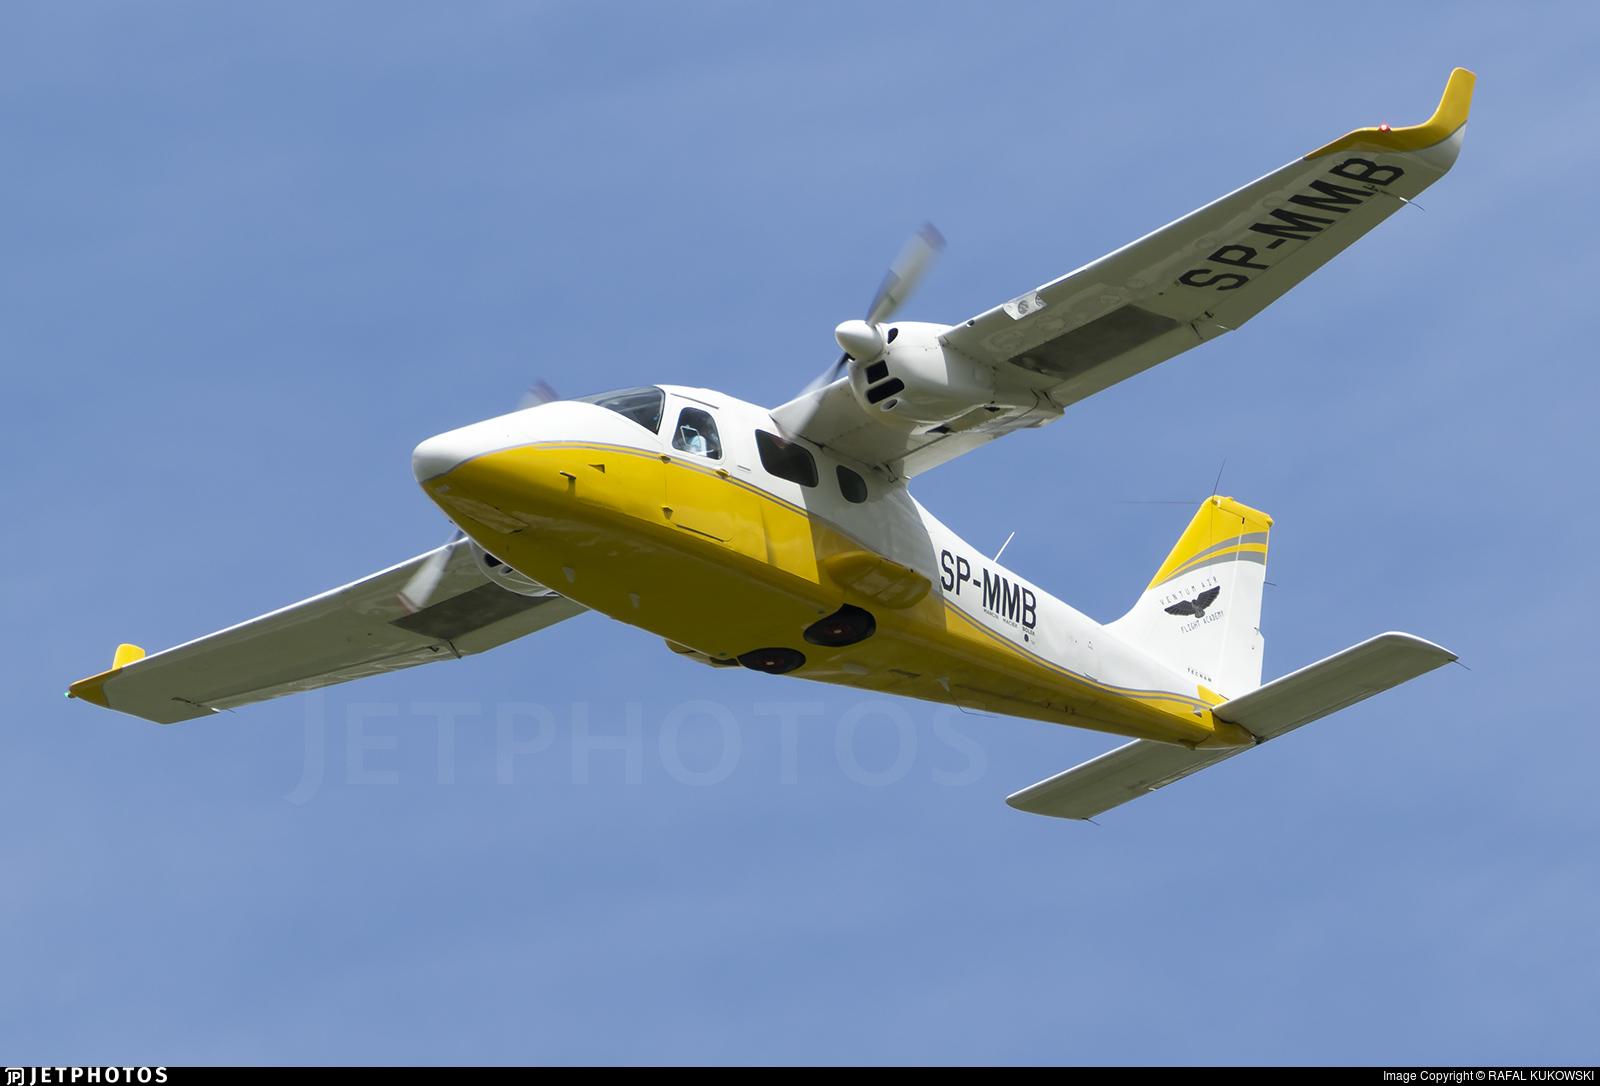 SP-MMB - Tecnam P2006T - Ventum Air Flight Academy